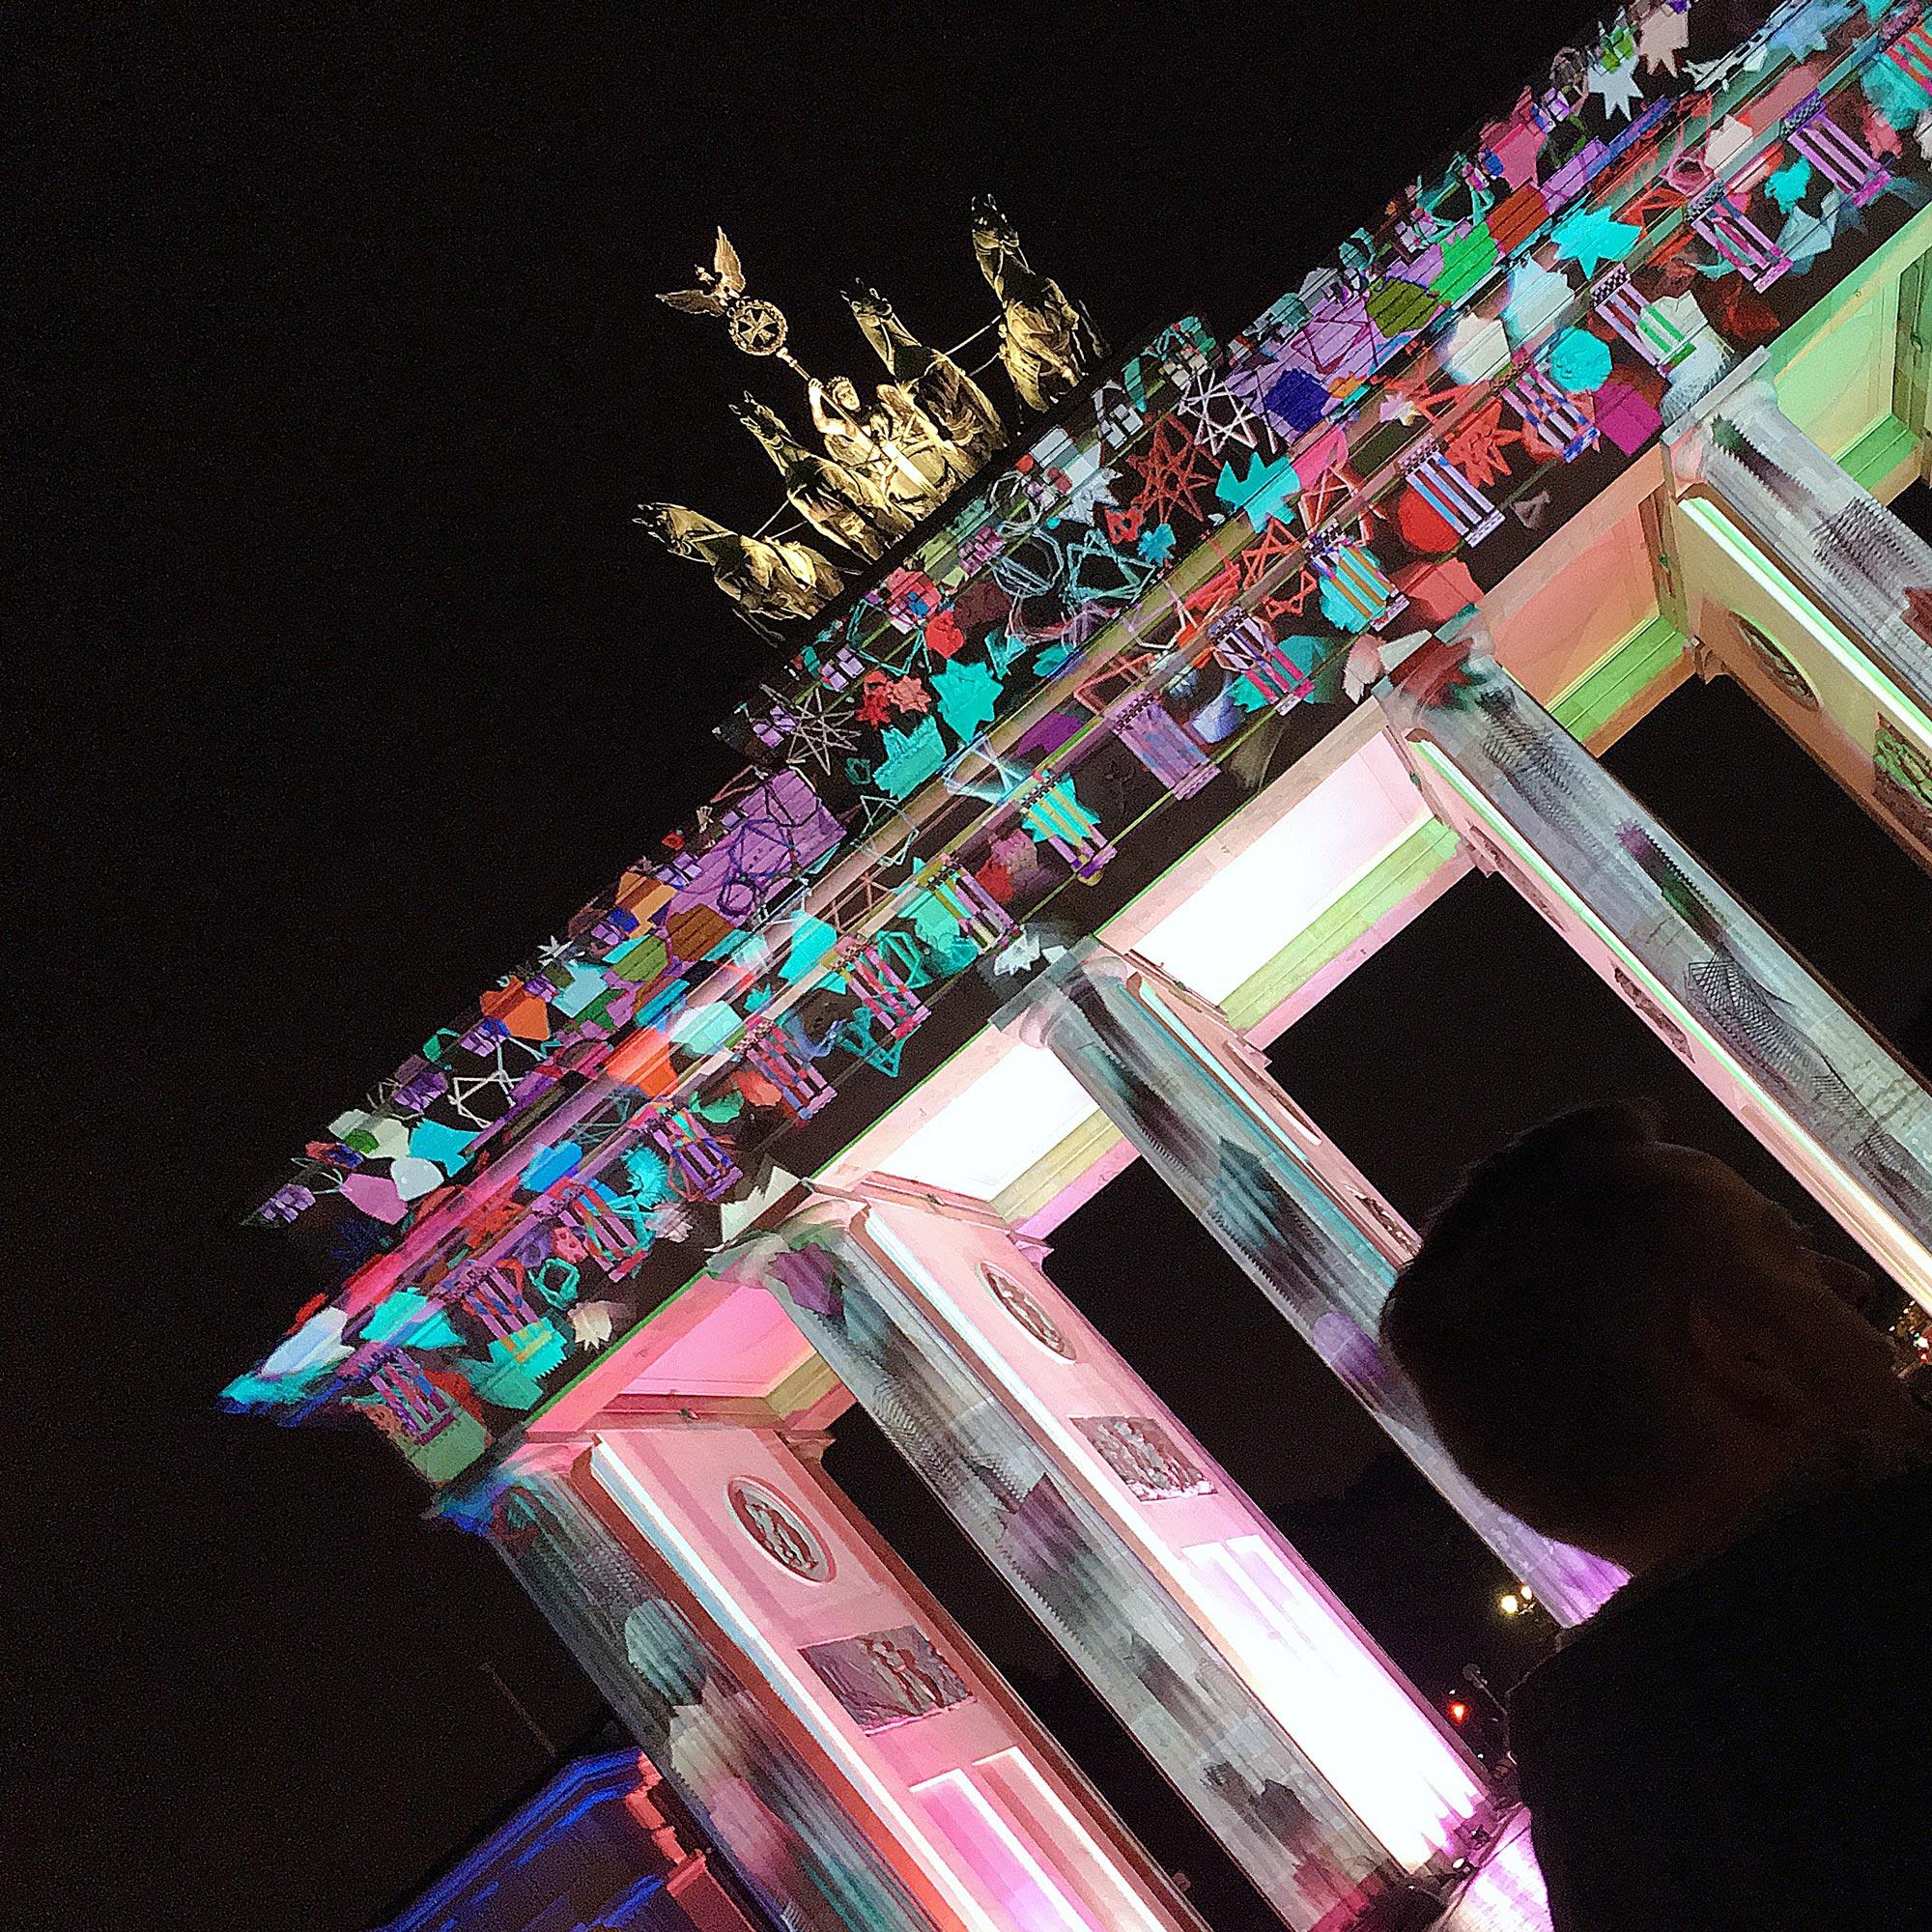 Festival of Lights Brandenburger Tor D